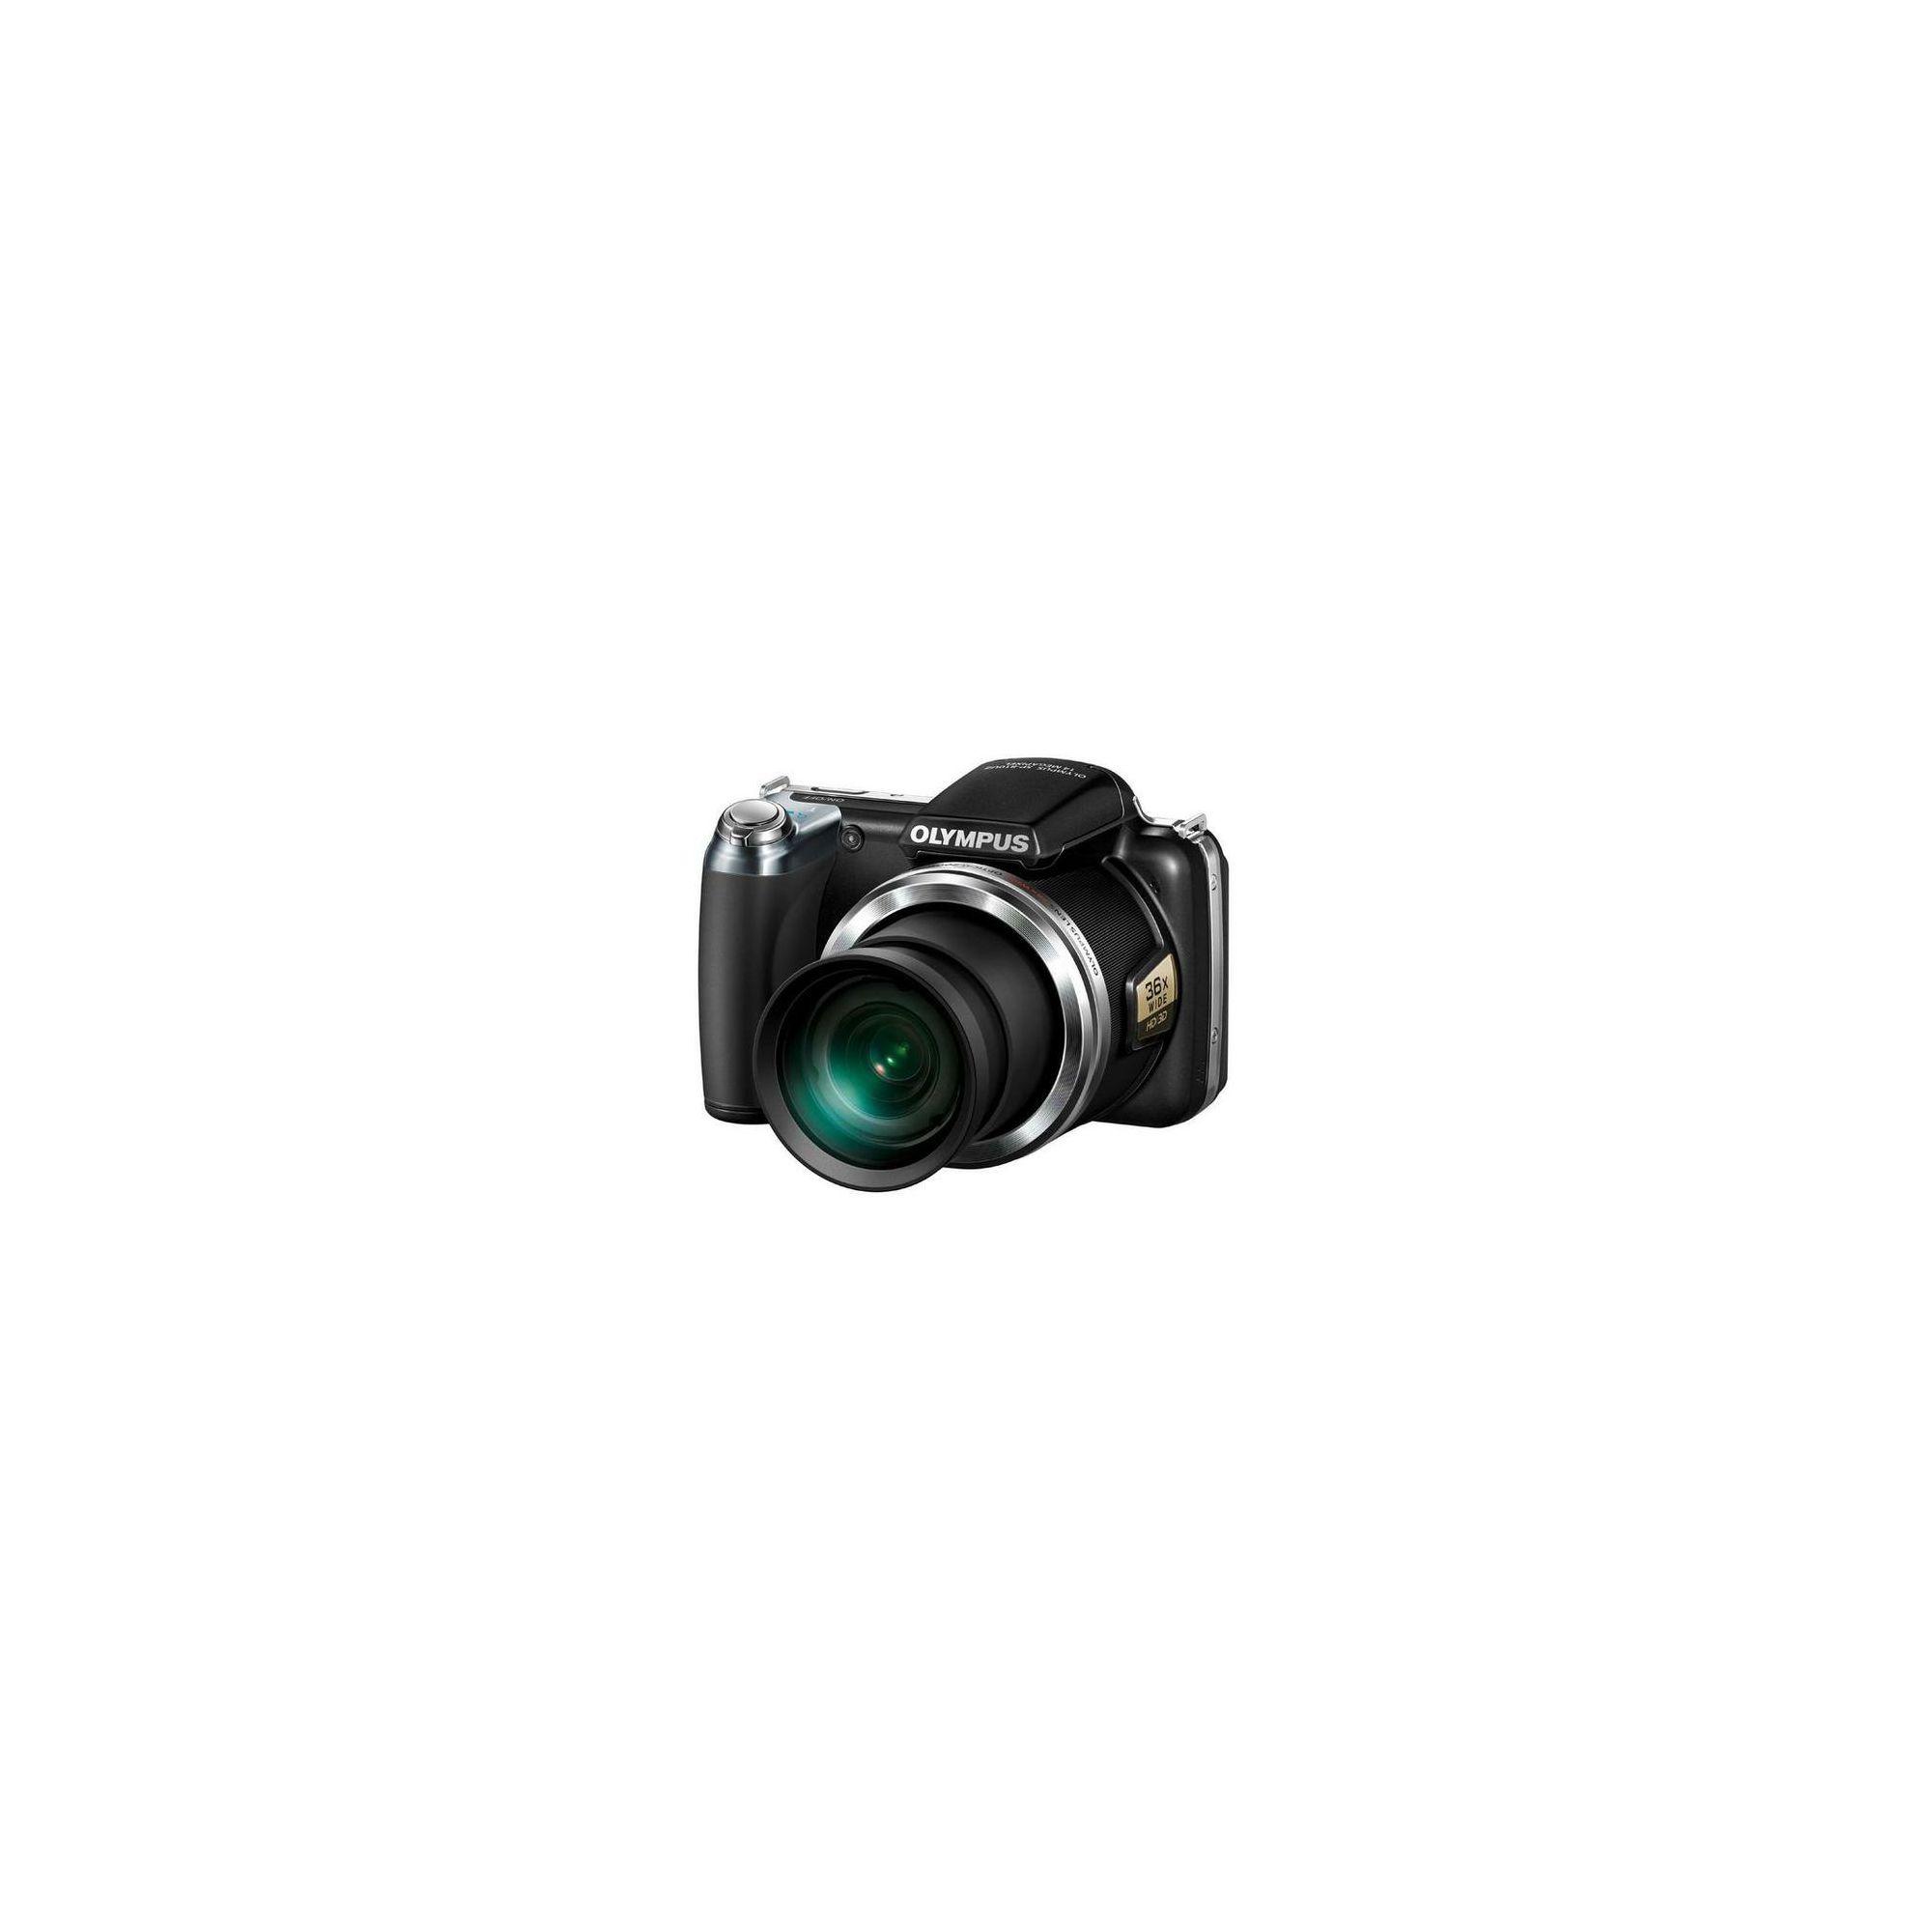 Olympus SP-810UZ 14MP Digital Camera - Black